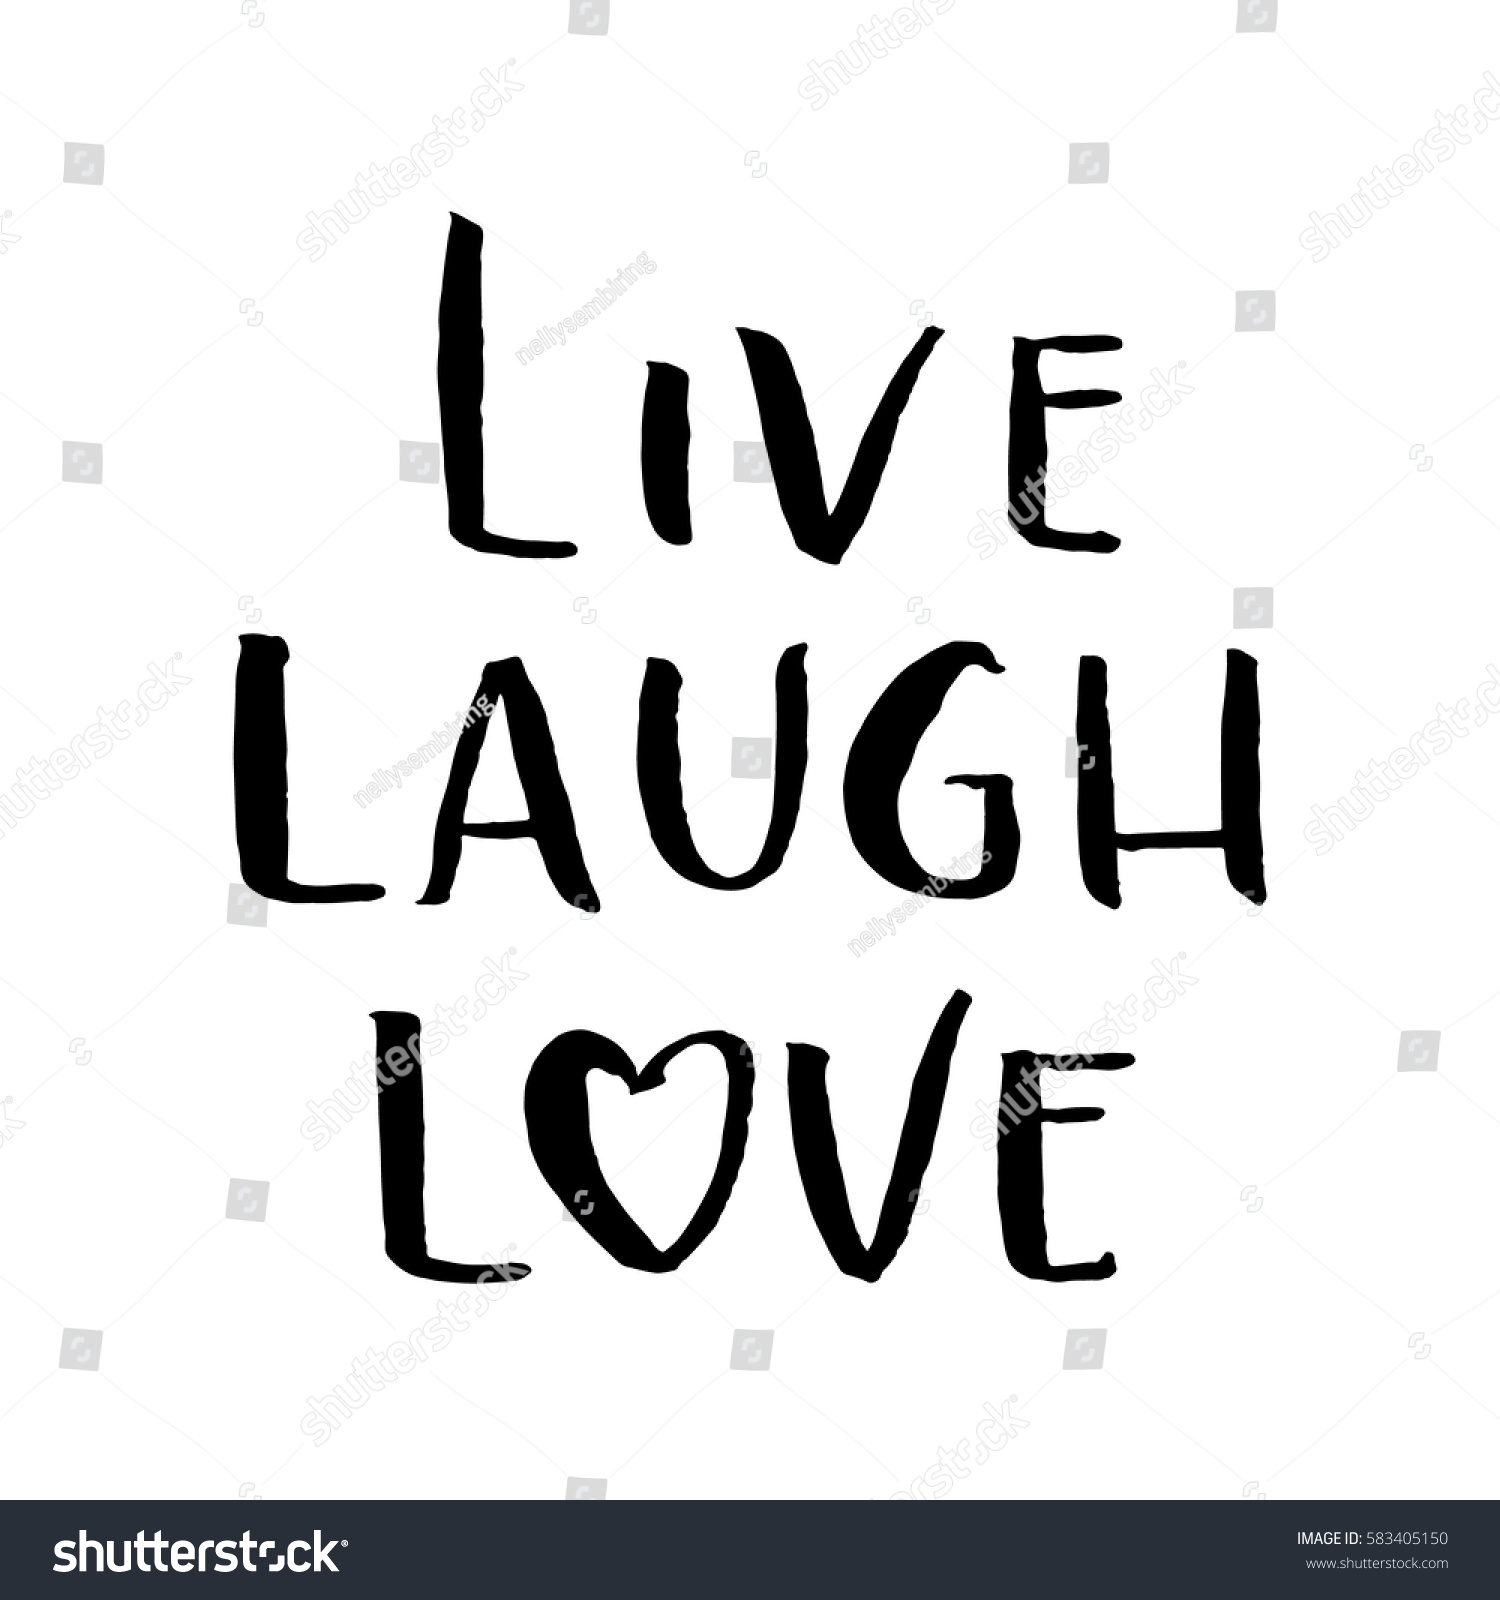 Live laugh love quotes